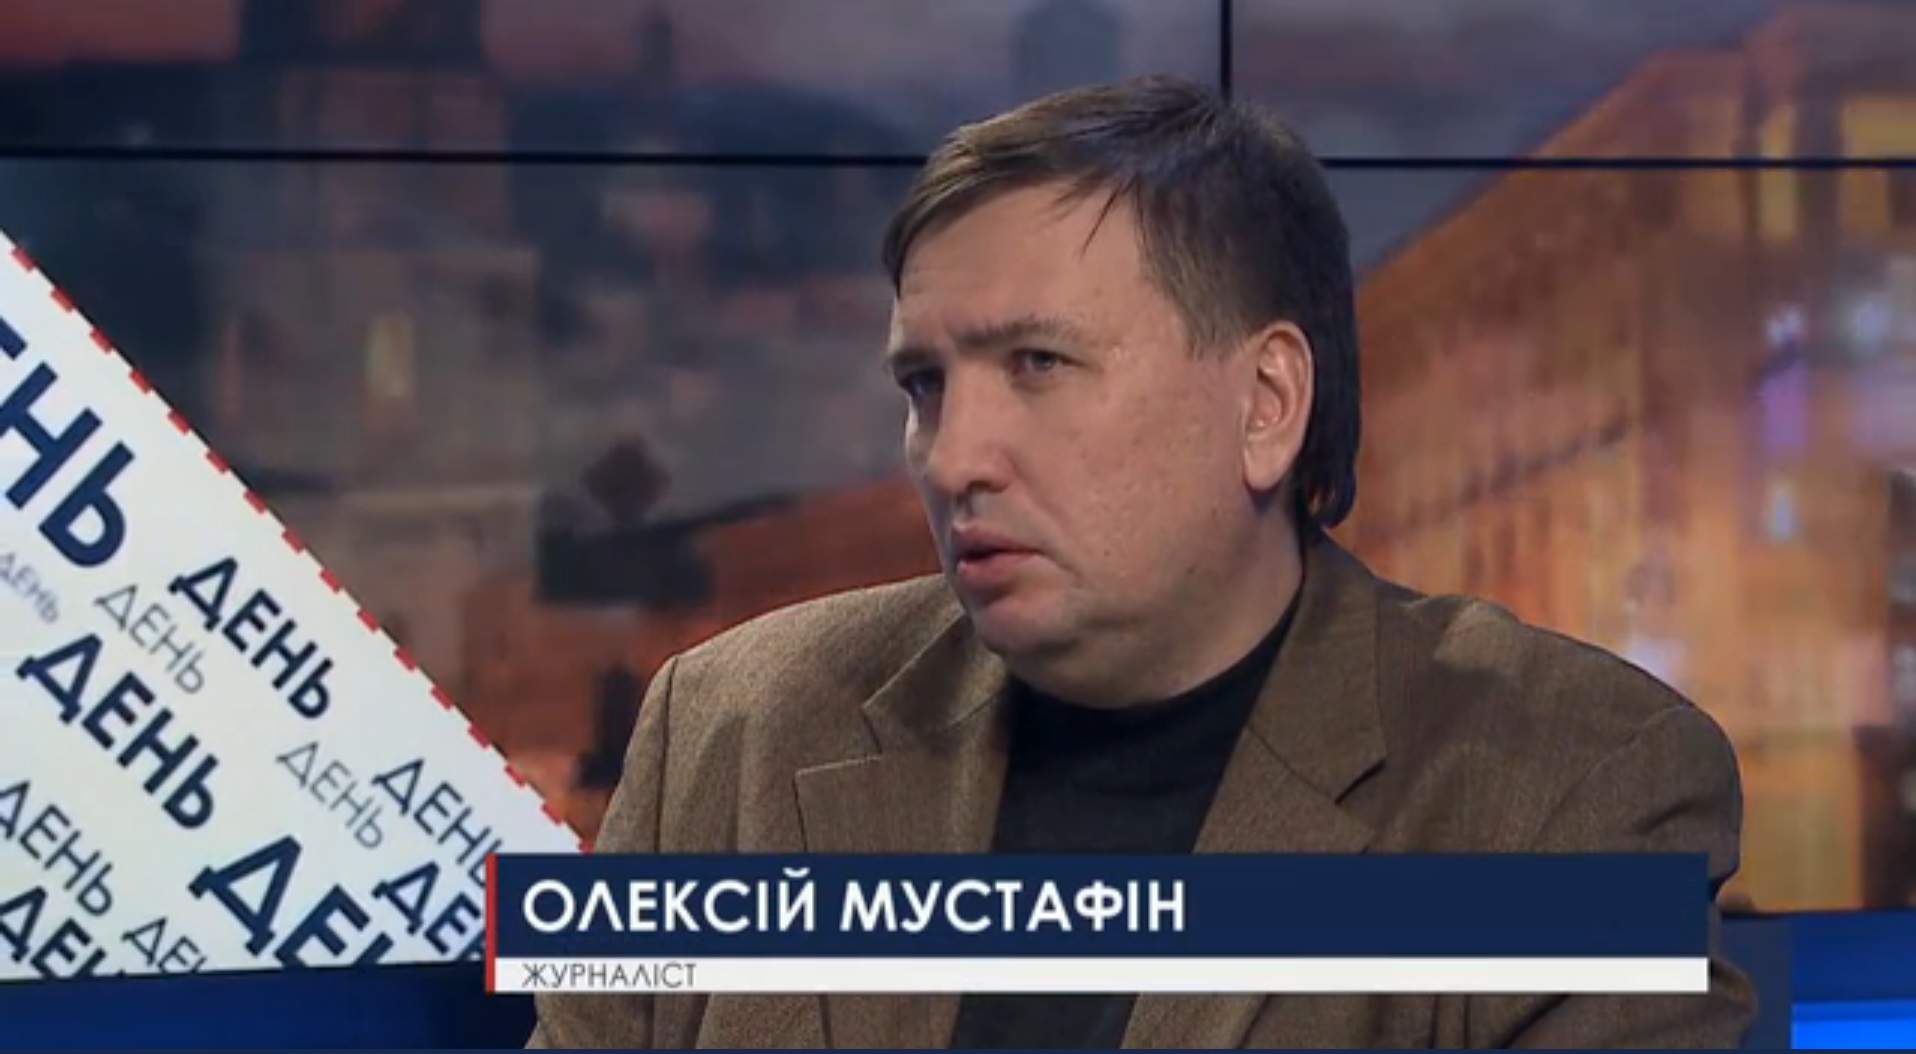 Алексей Мустафин возглавил новости на «Украине»